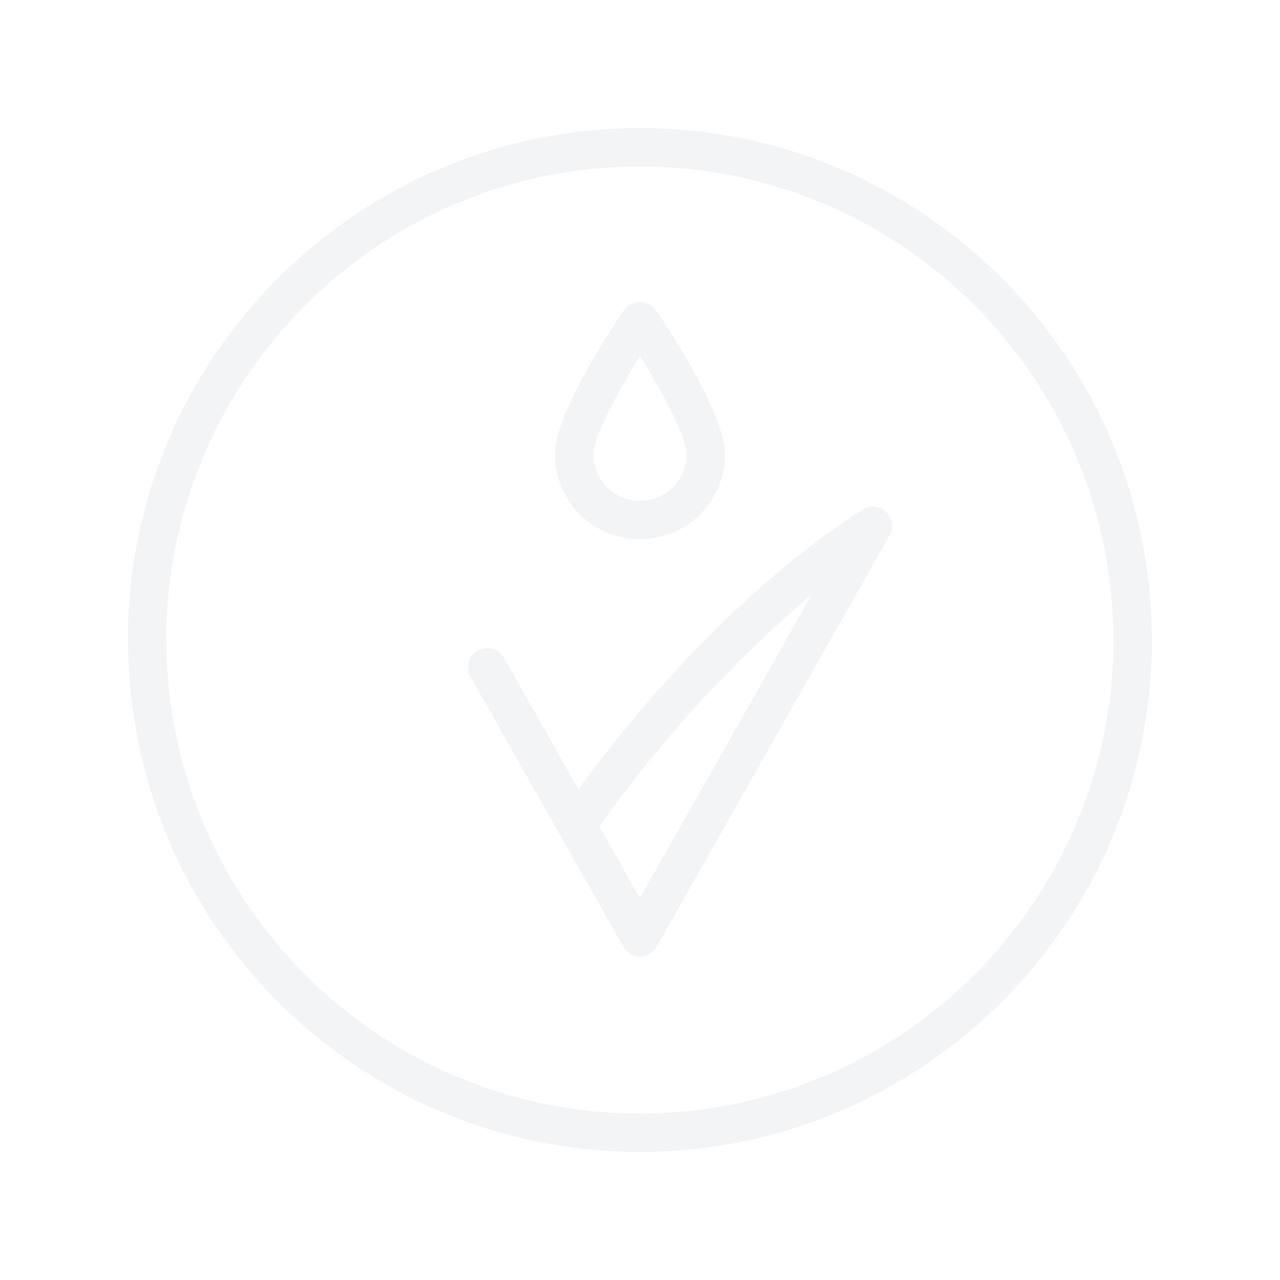 L'OREAL Infaillible Blush Paint Palette The Pinks палитра румян 10g